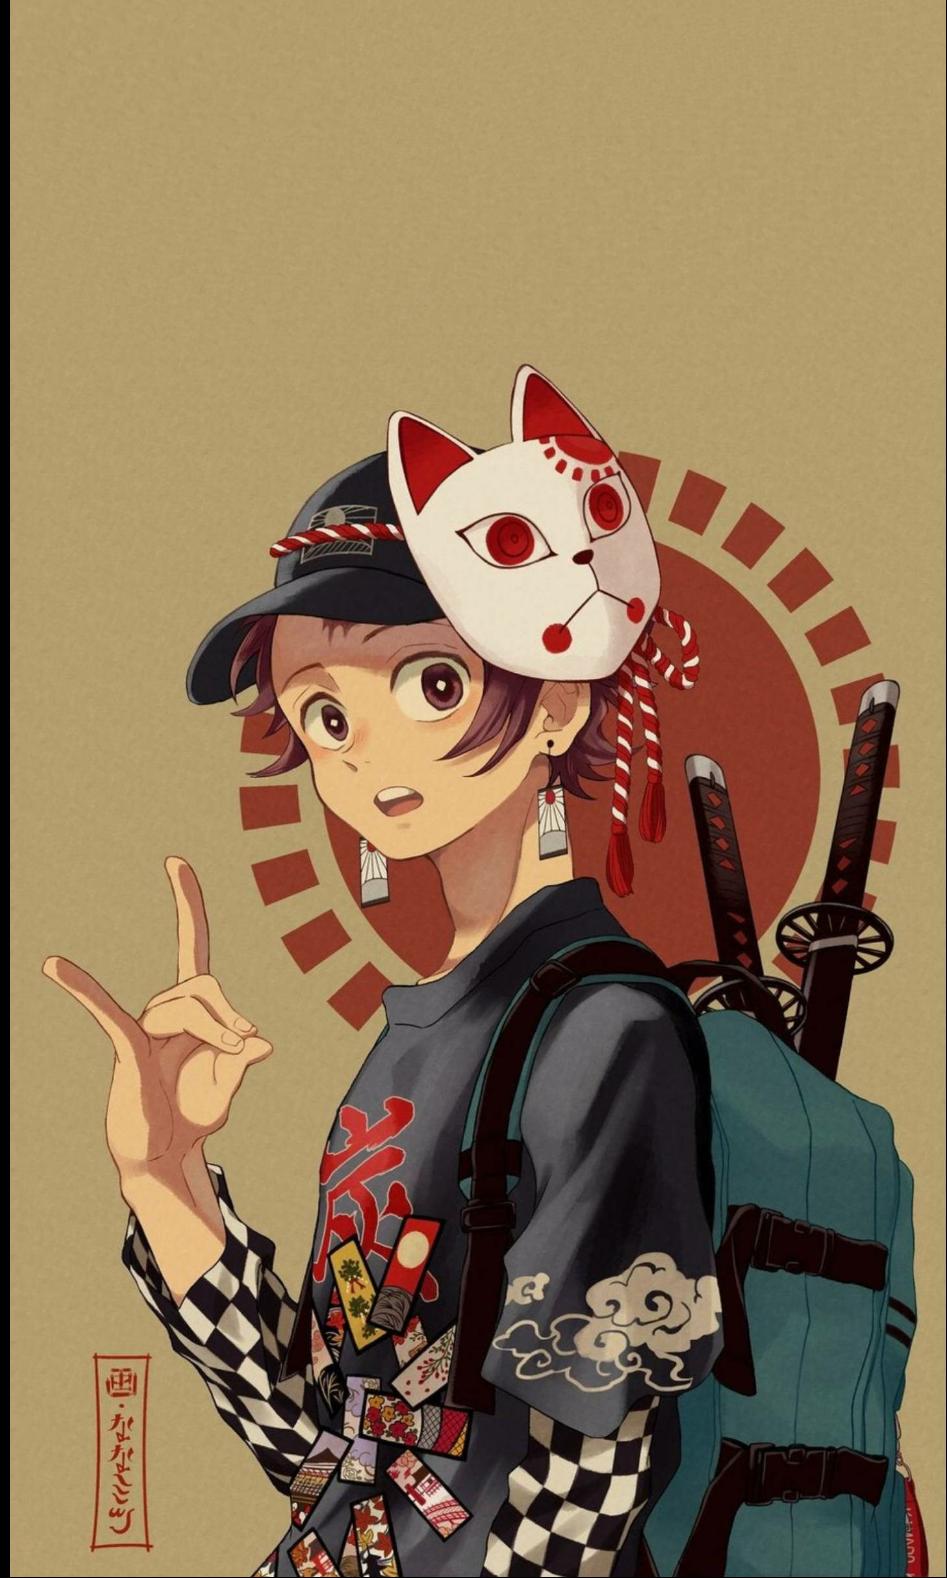 My boy from kimetsu no yaiba ( demon slayer)